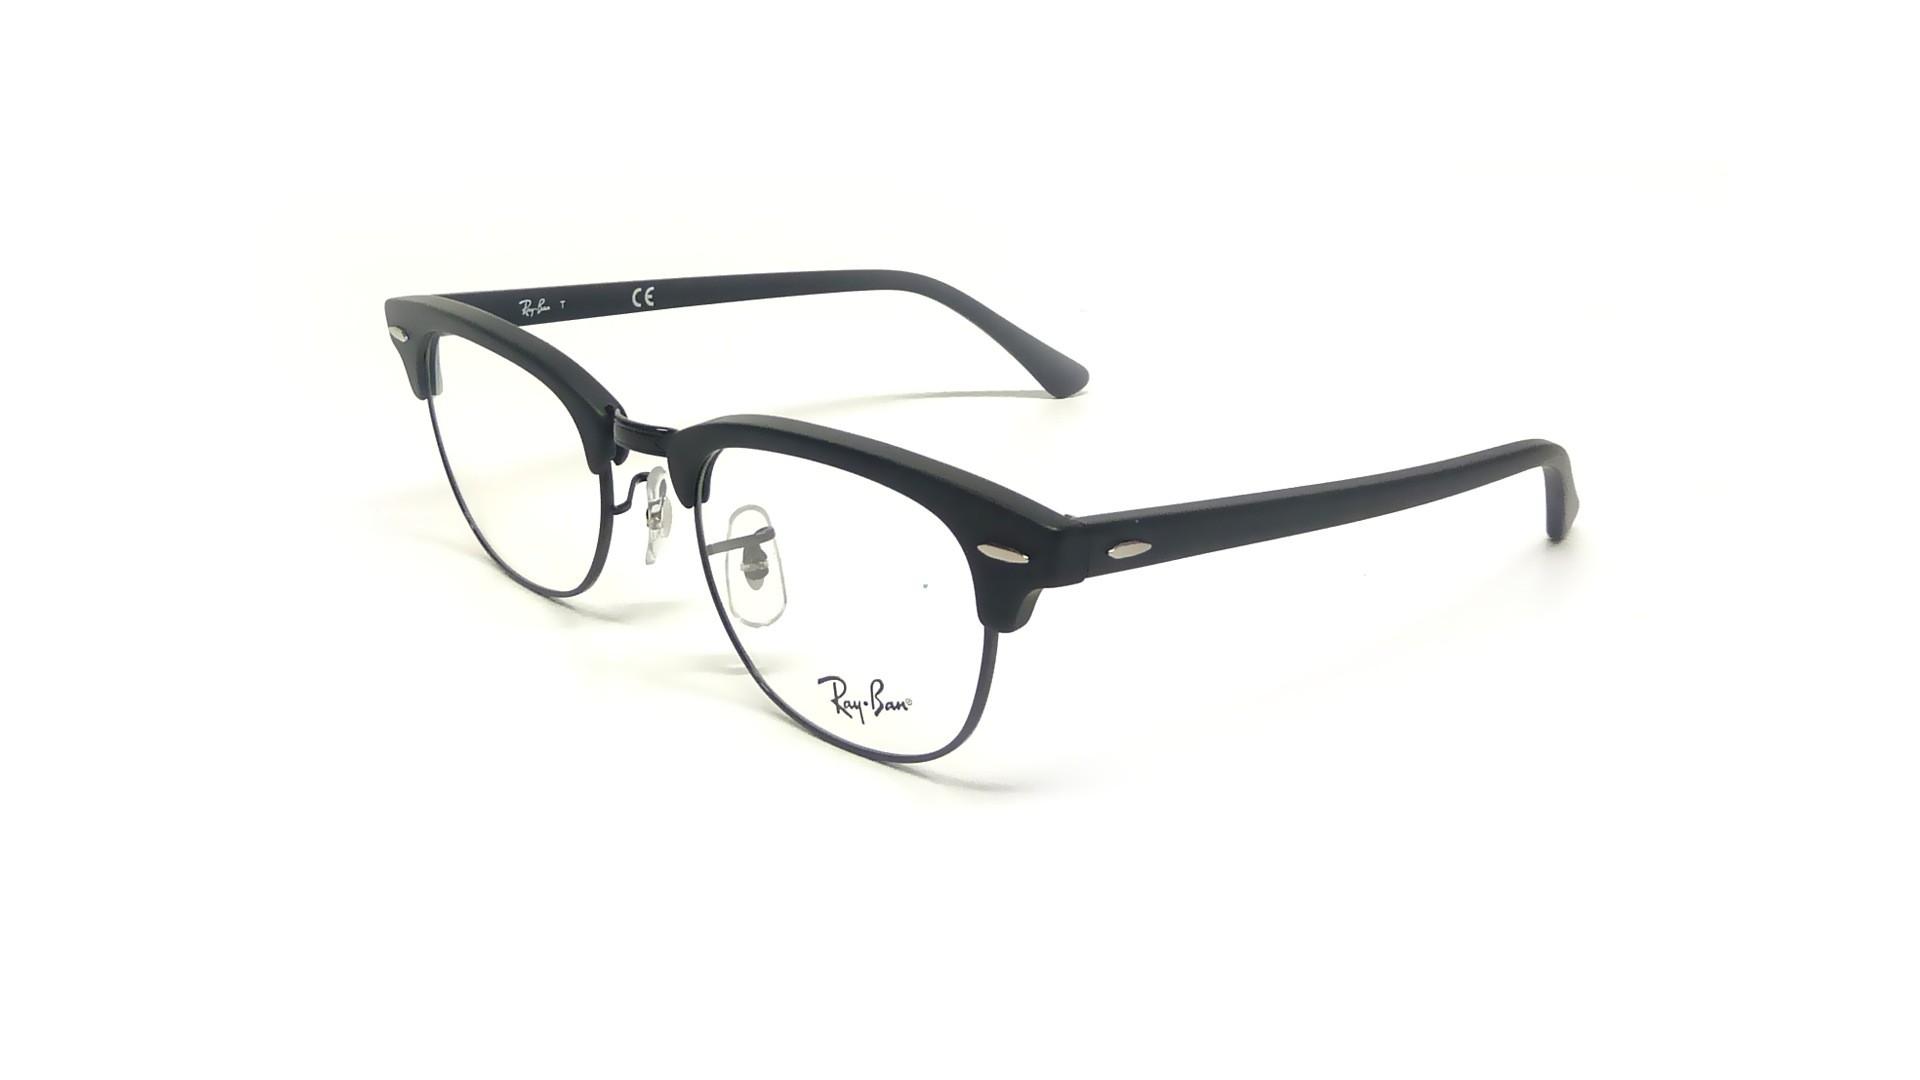 clubmaster ray ban eyeglasses  Ban Clubmaster Black RX5154 RB5154 2077 51-21